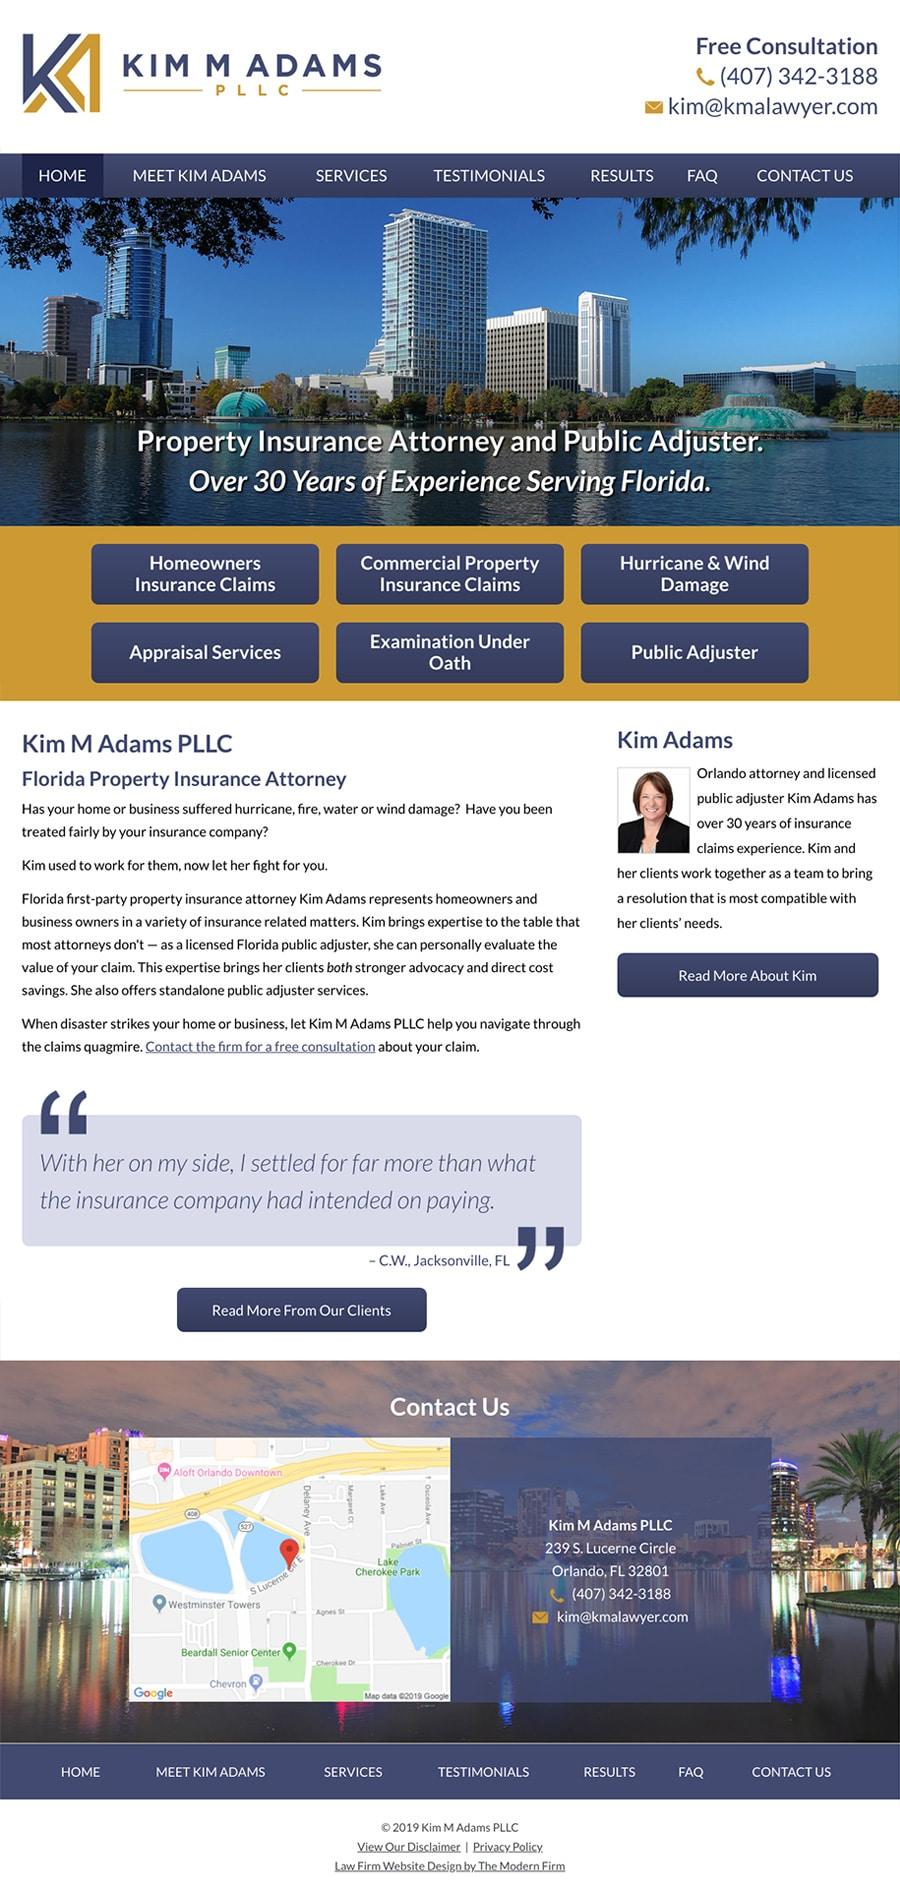 Law Firm Website Design for Kim M Adams PLLC